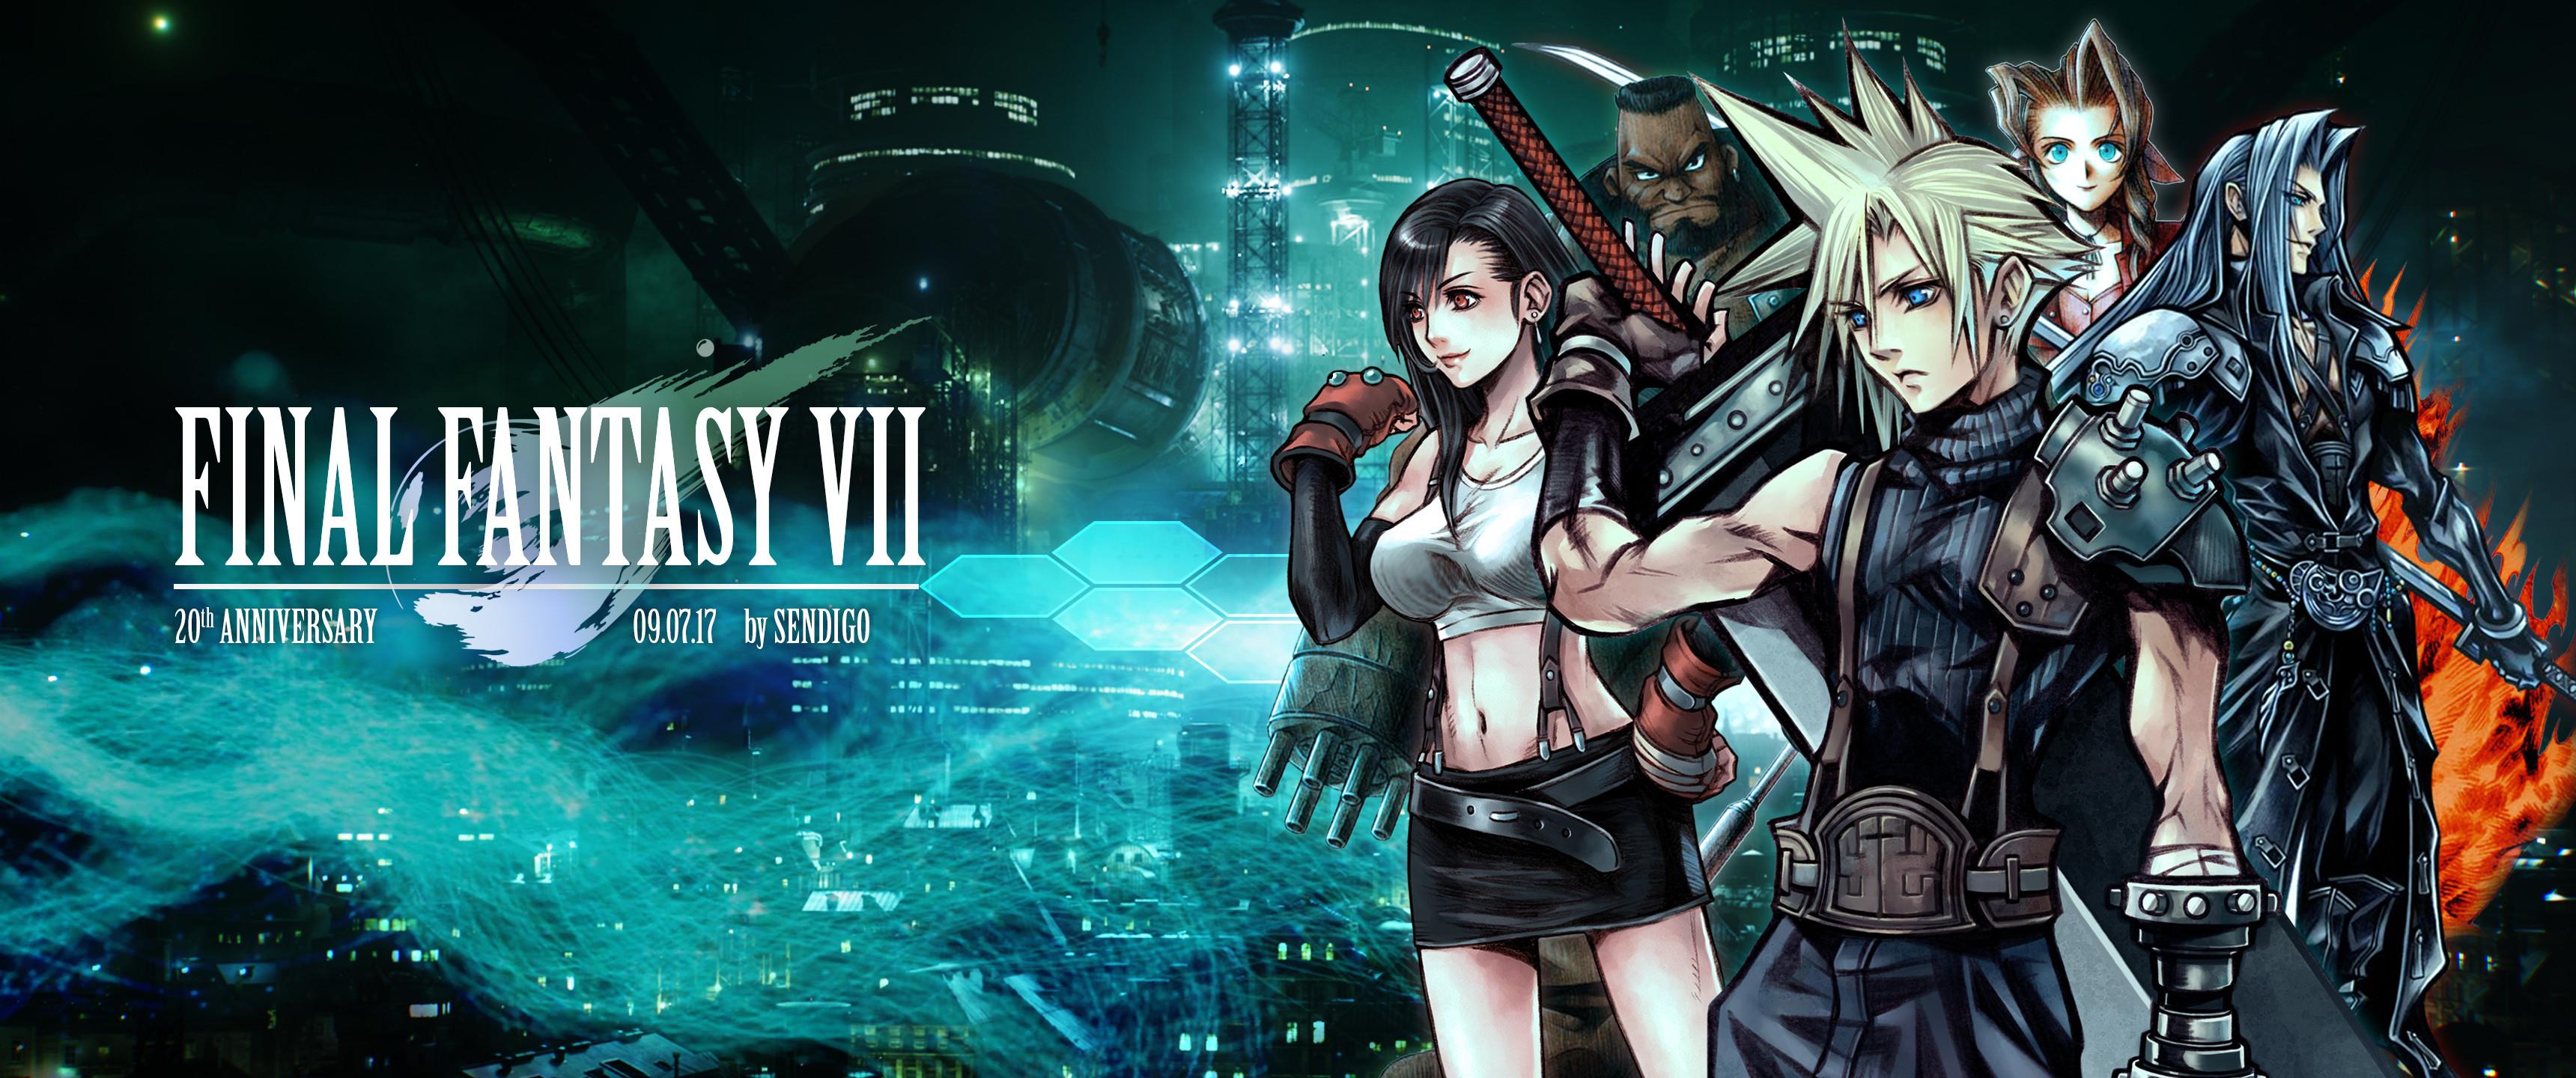 … Final Fantasy VII: 20th Anniversary Wallpaper by Sendigo